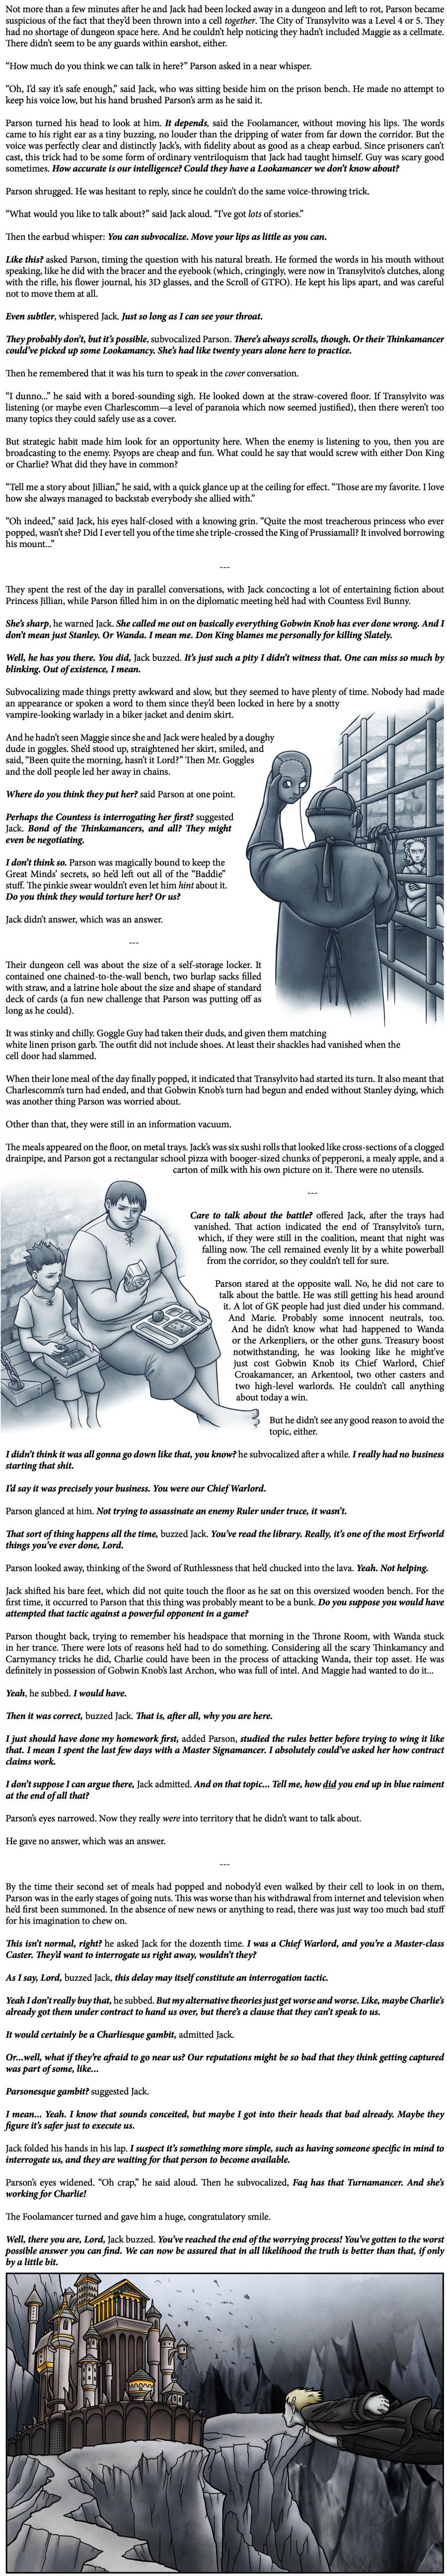 Comic - Book 3 - Page 145